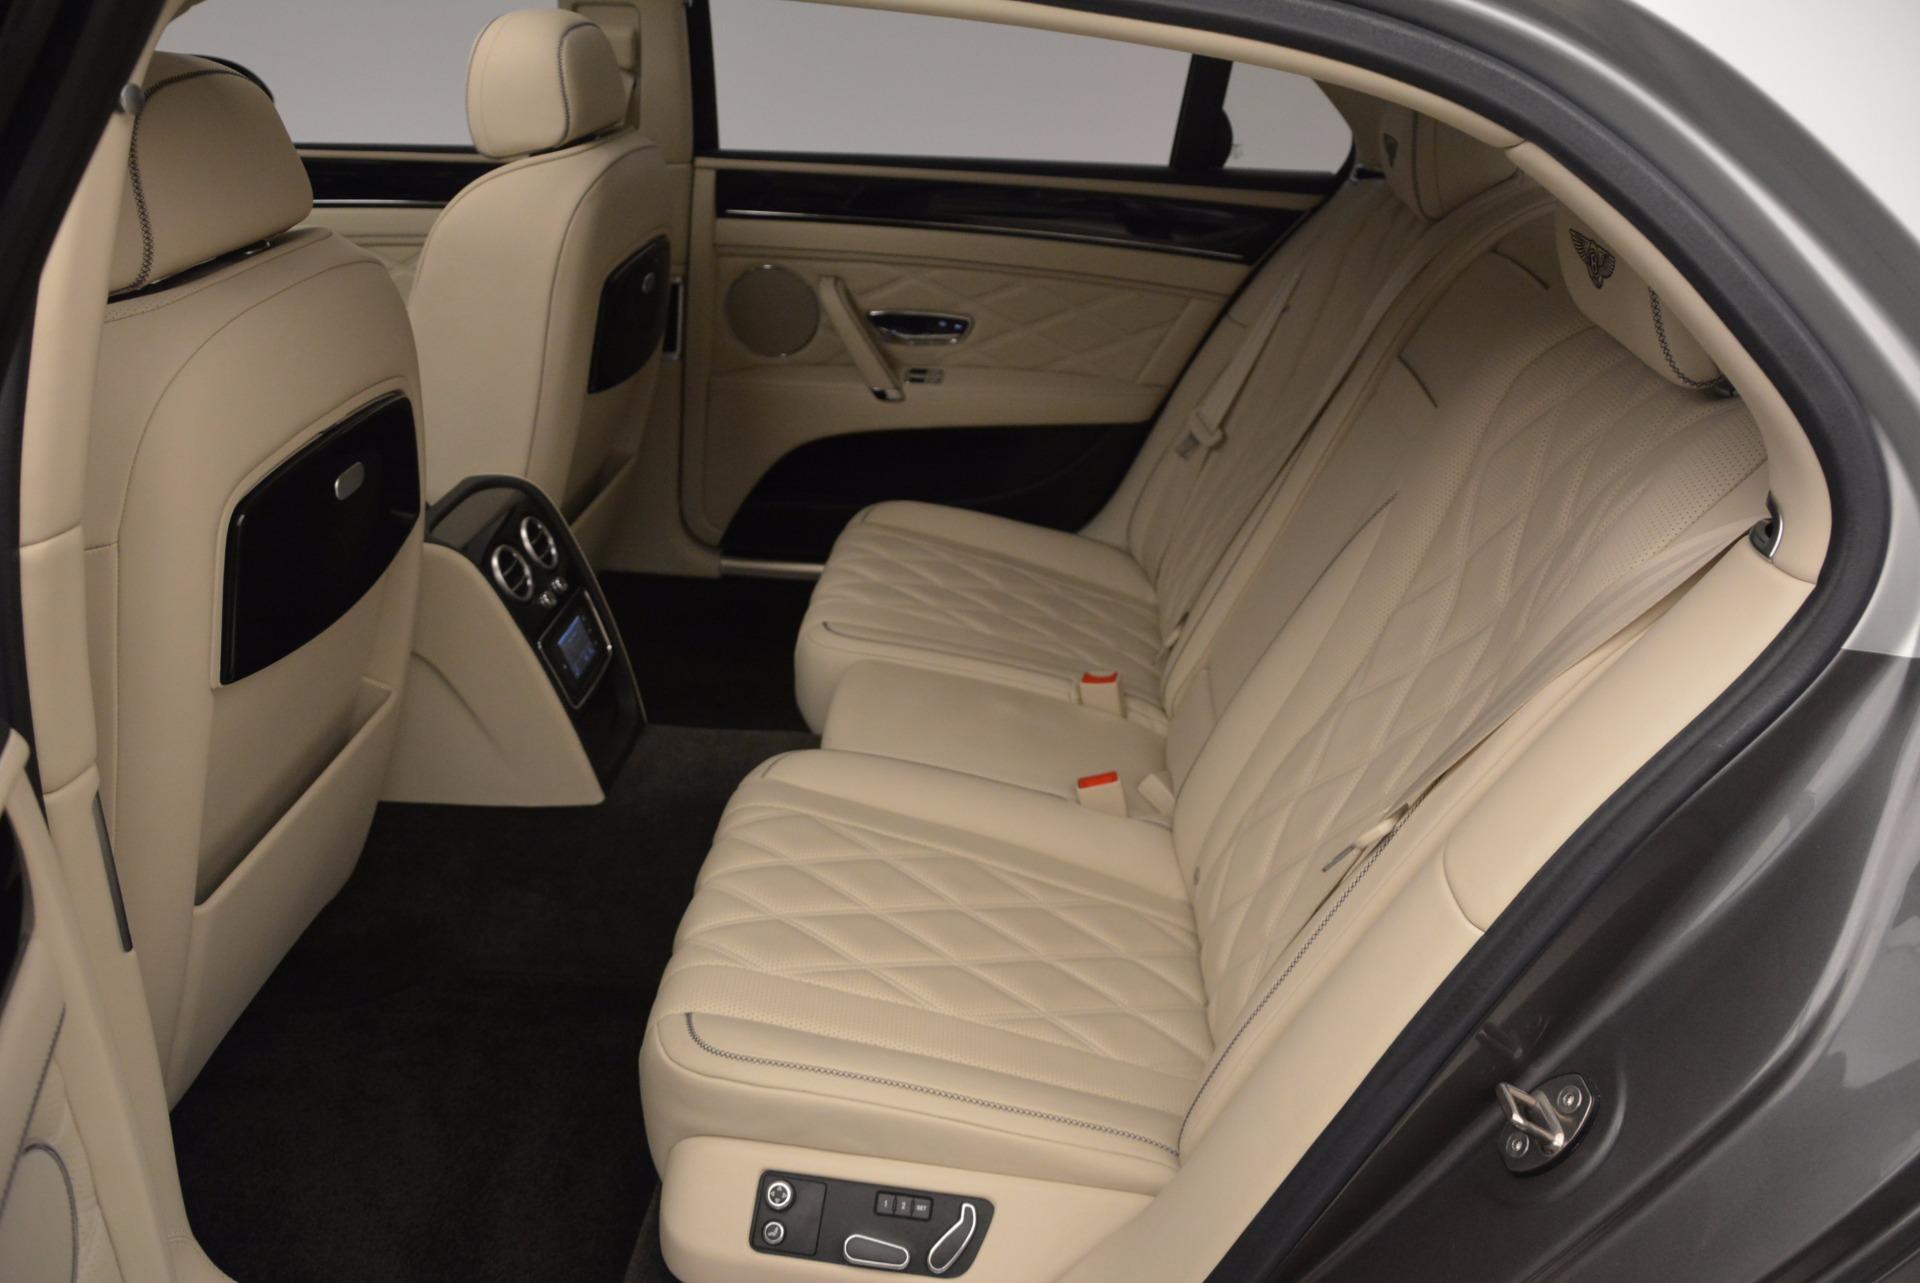 Used 2015 Bentley Flying Spur W12 For Sale In Westport, CT 1582_p30